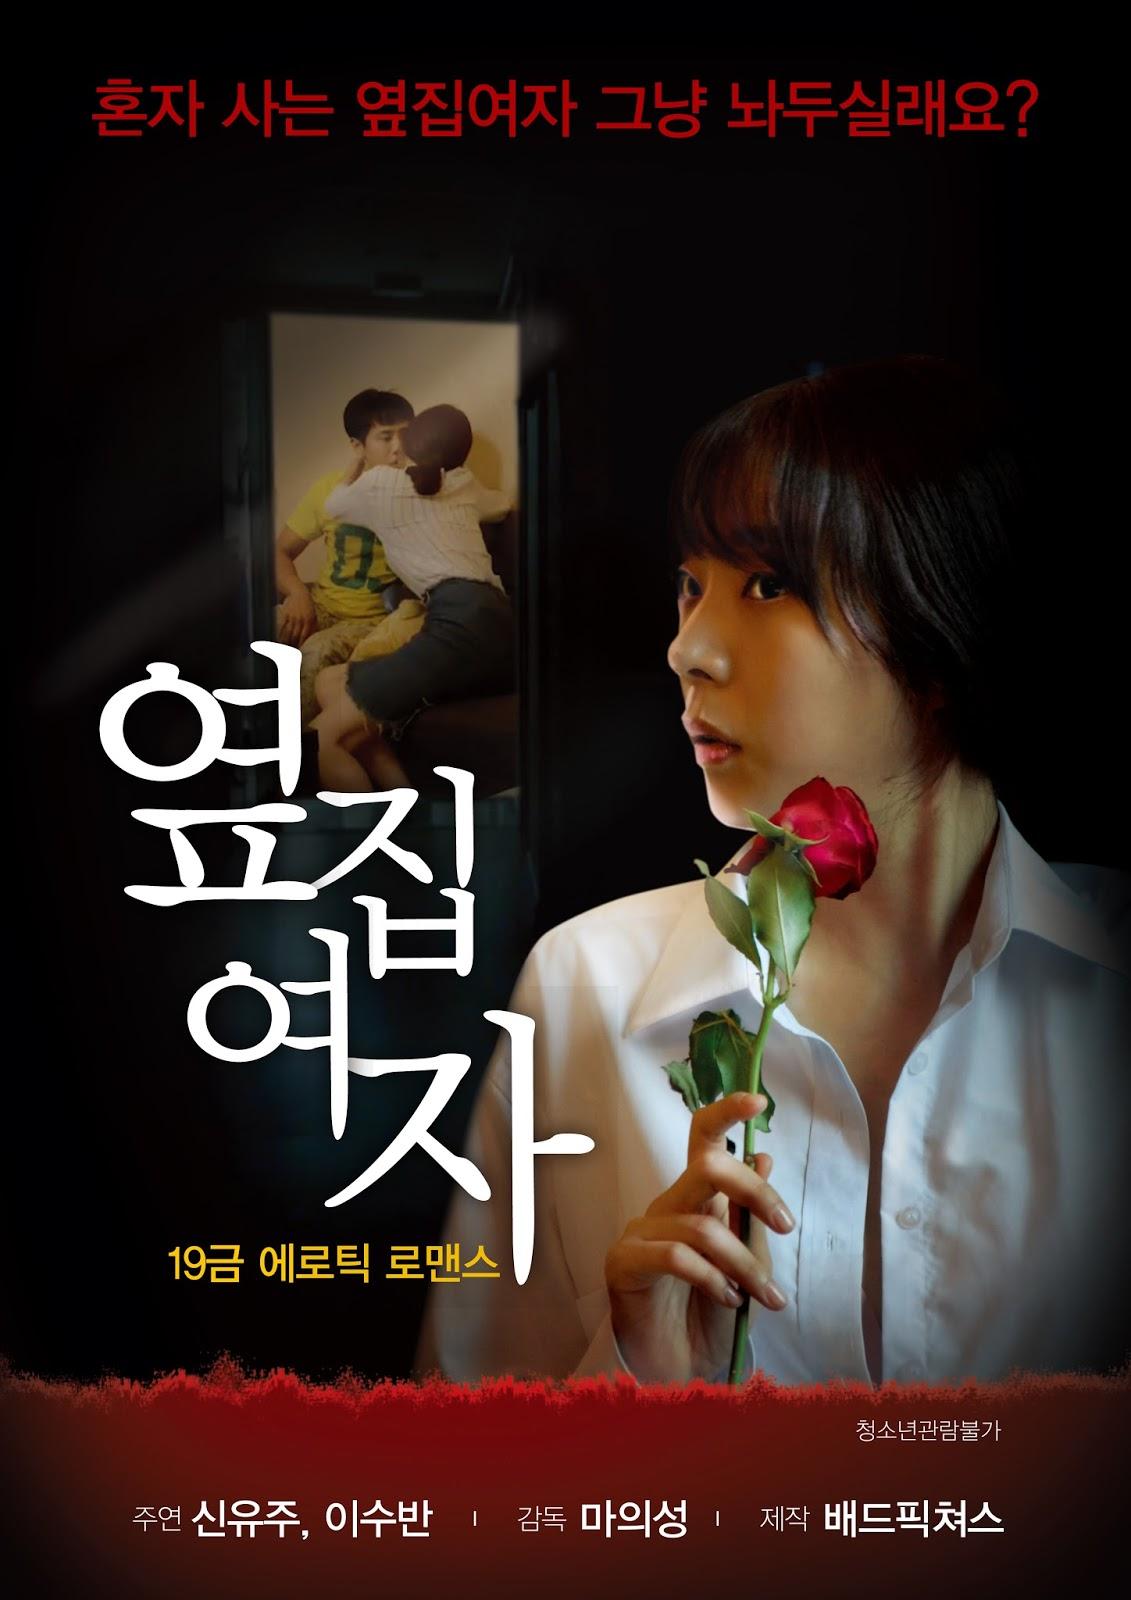 Next Door Woman (2017) 옆집여자 [เกาหลี 18+] [Soundtrack ไม่มีบรรยายไทย]